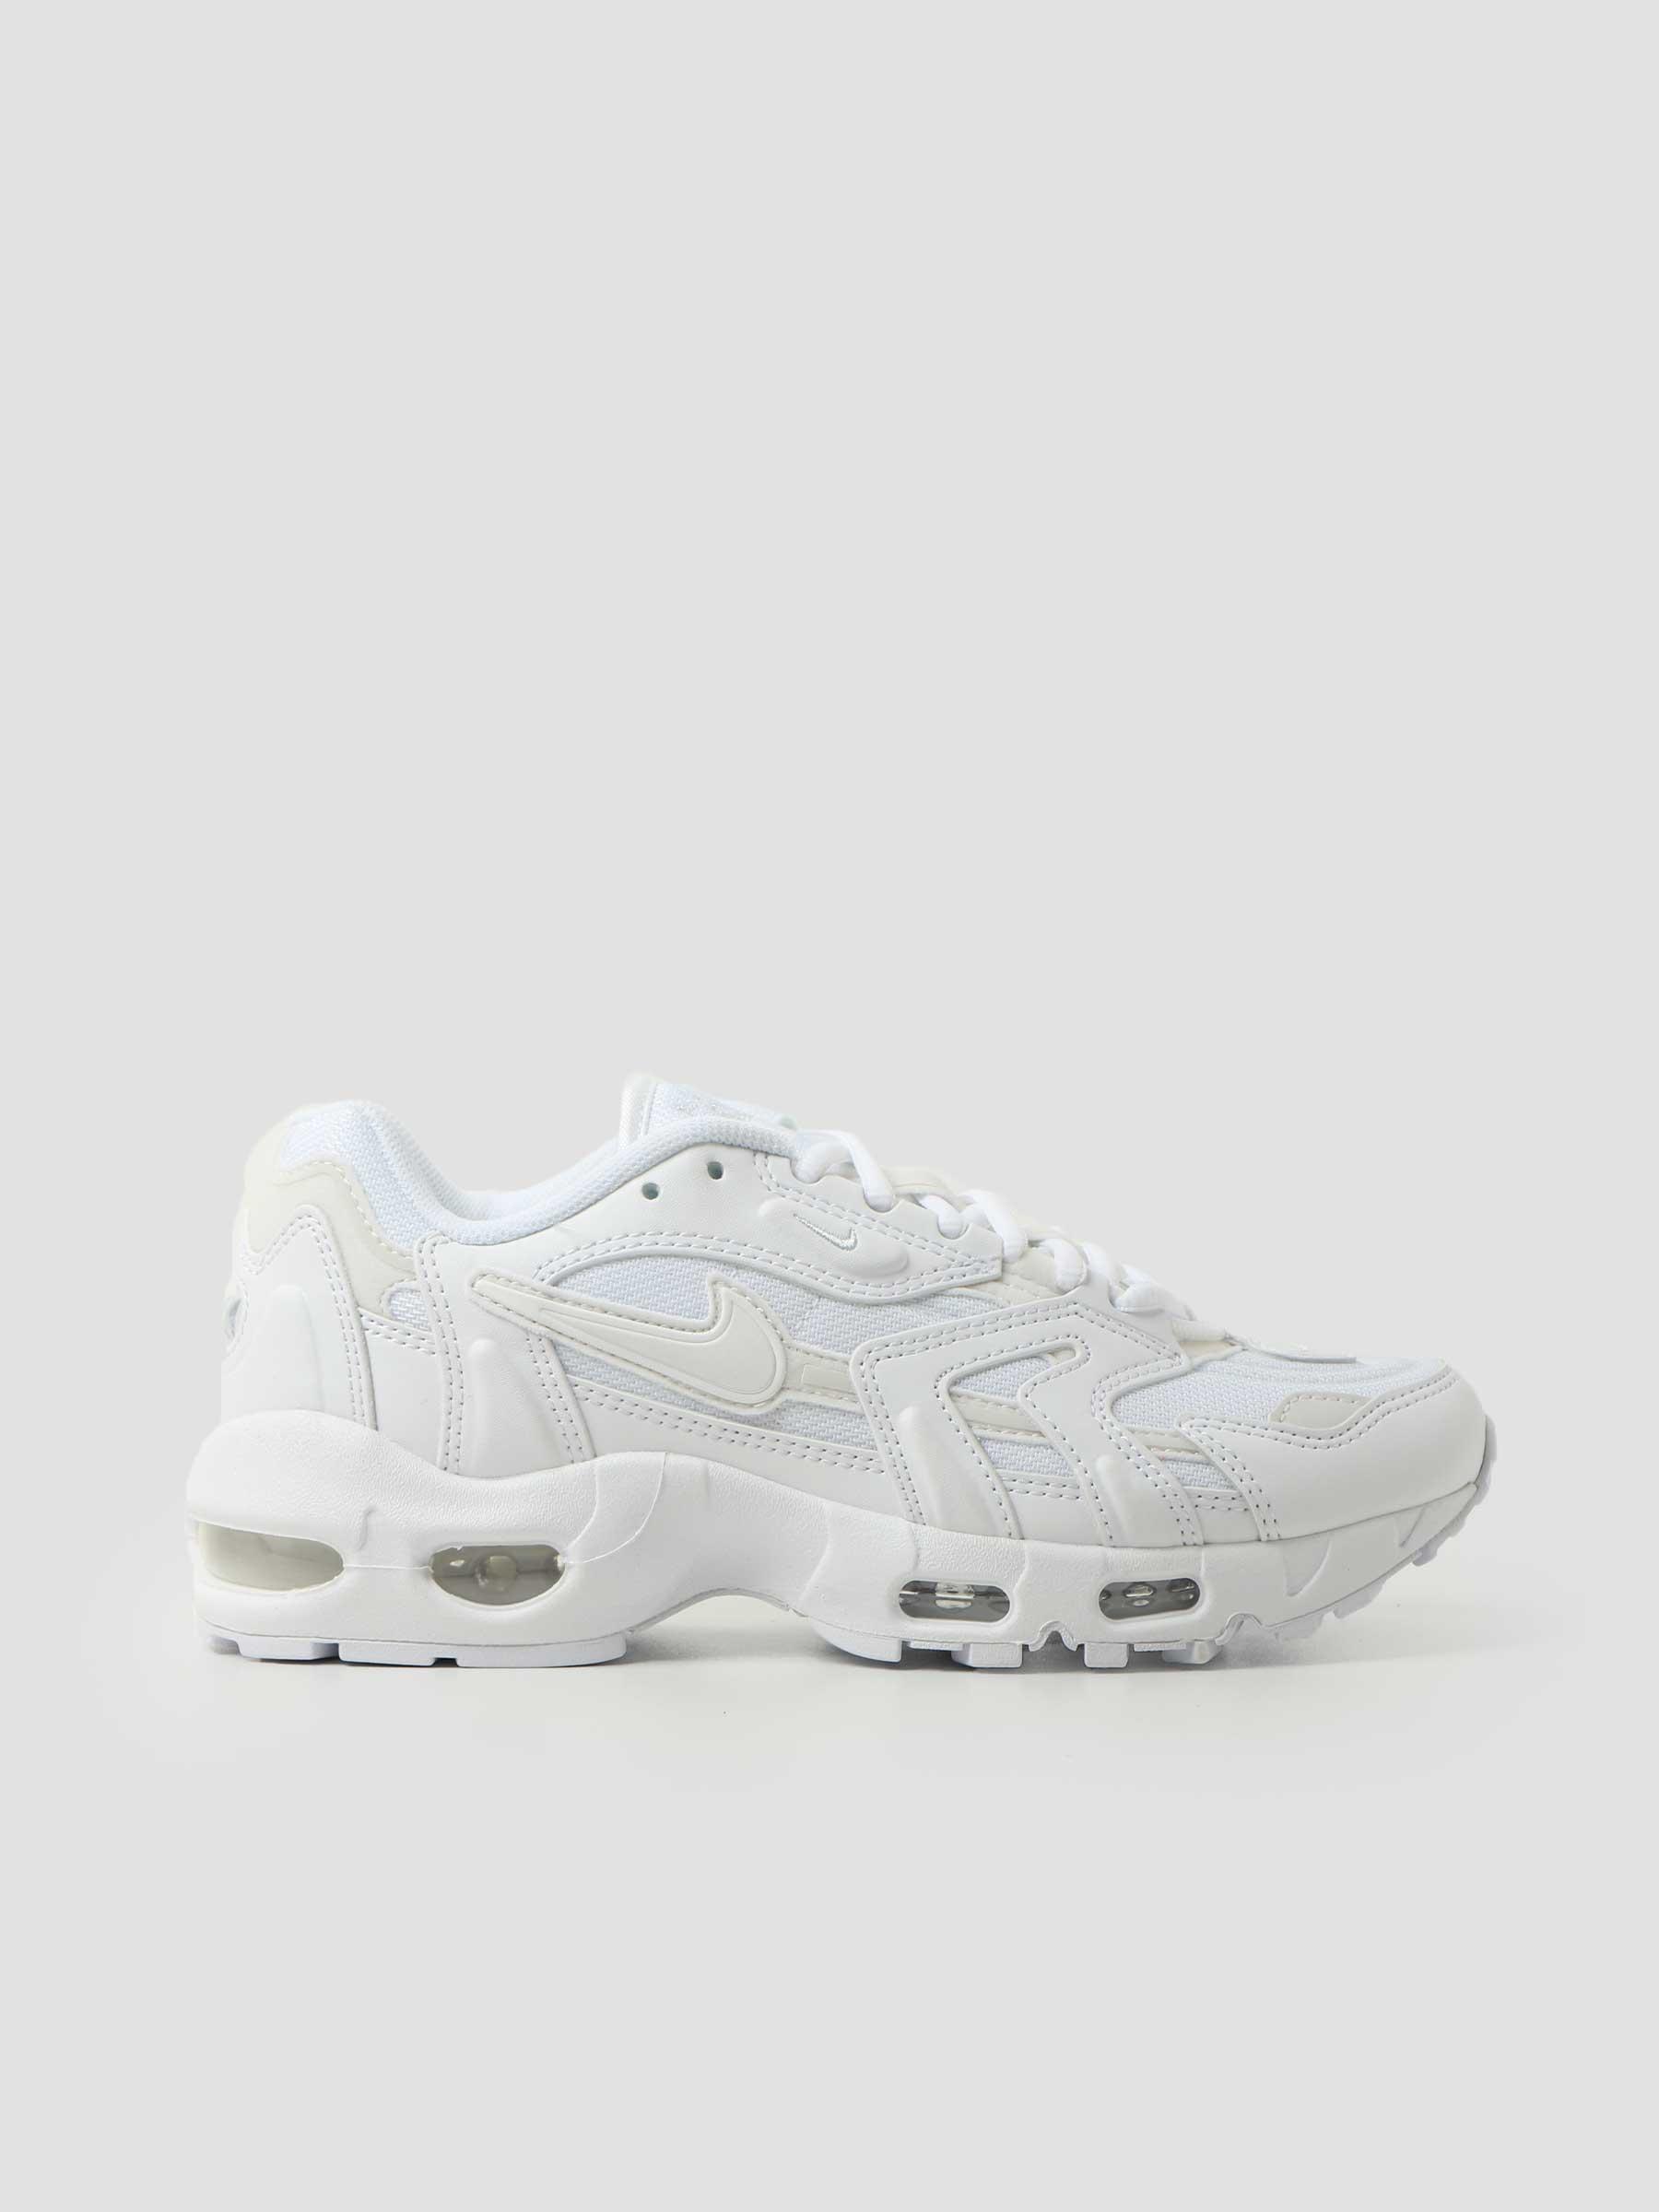 W Nike Air Max 96 Ii White White Pure Platinum DM2361-100